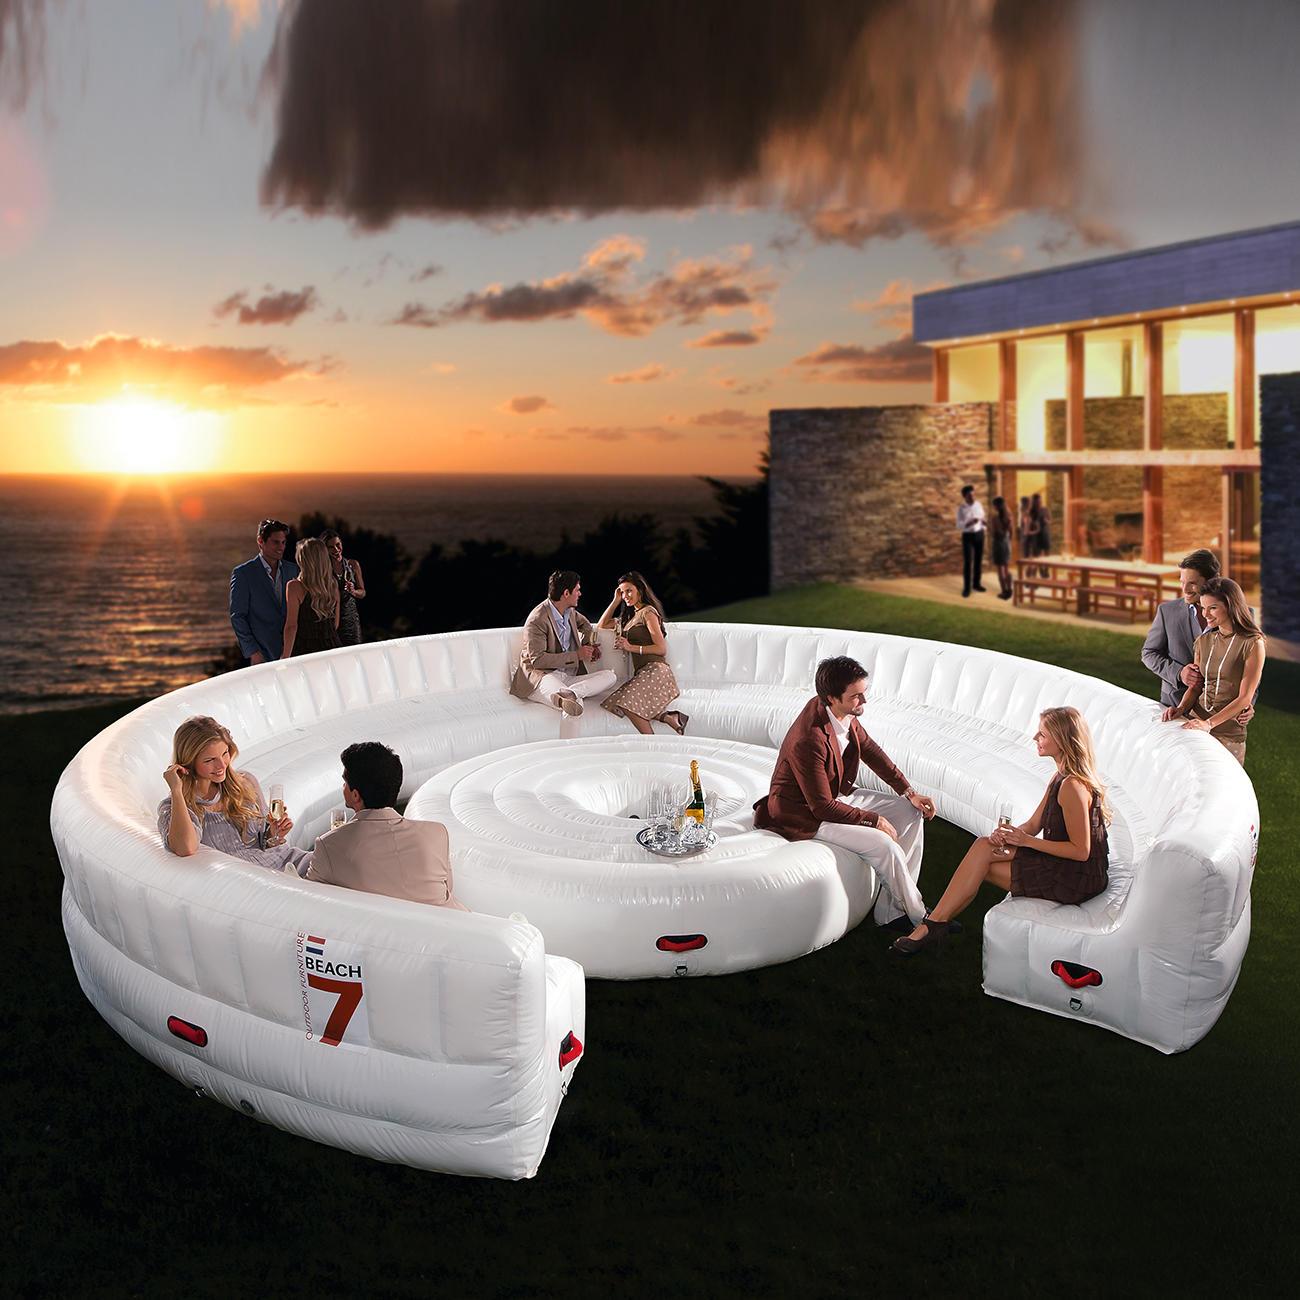 airlounge 3 jahre garantie pro idee. Black Bedroom Furniture Sets. Home Design Ideas